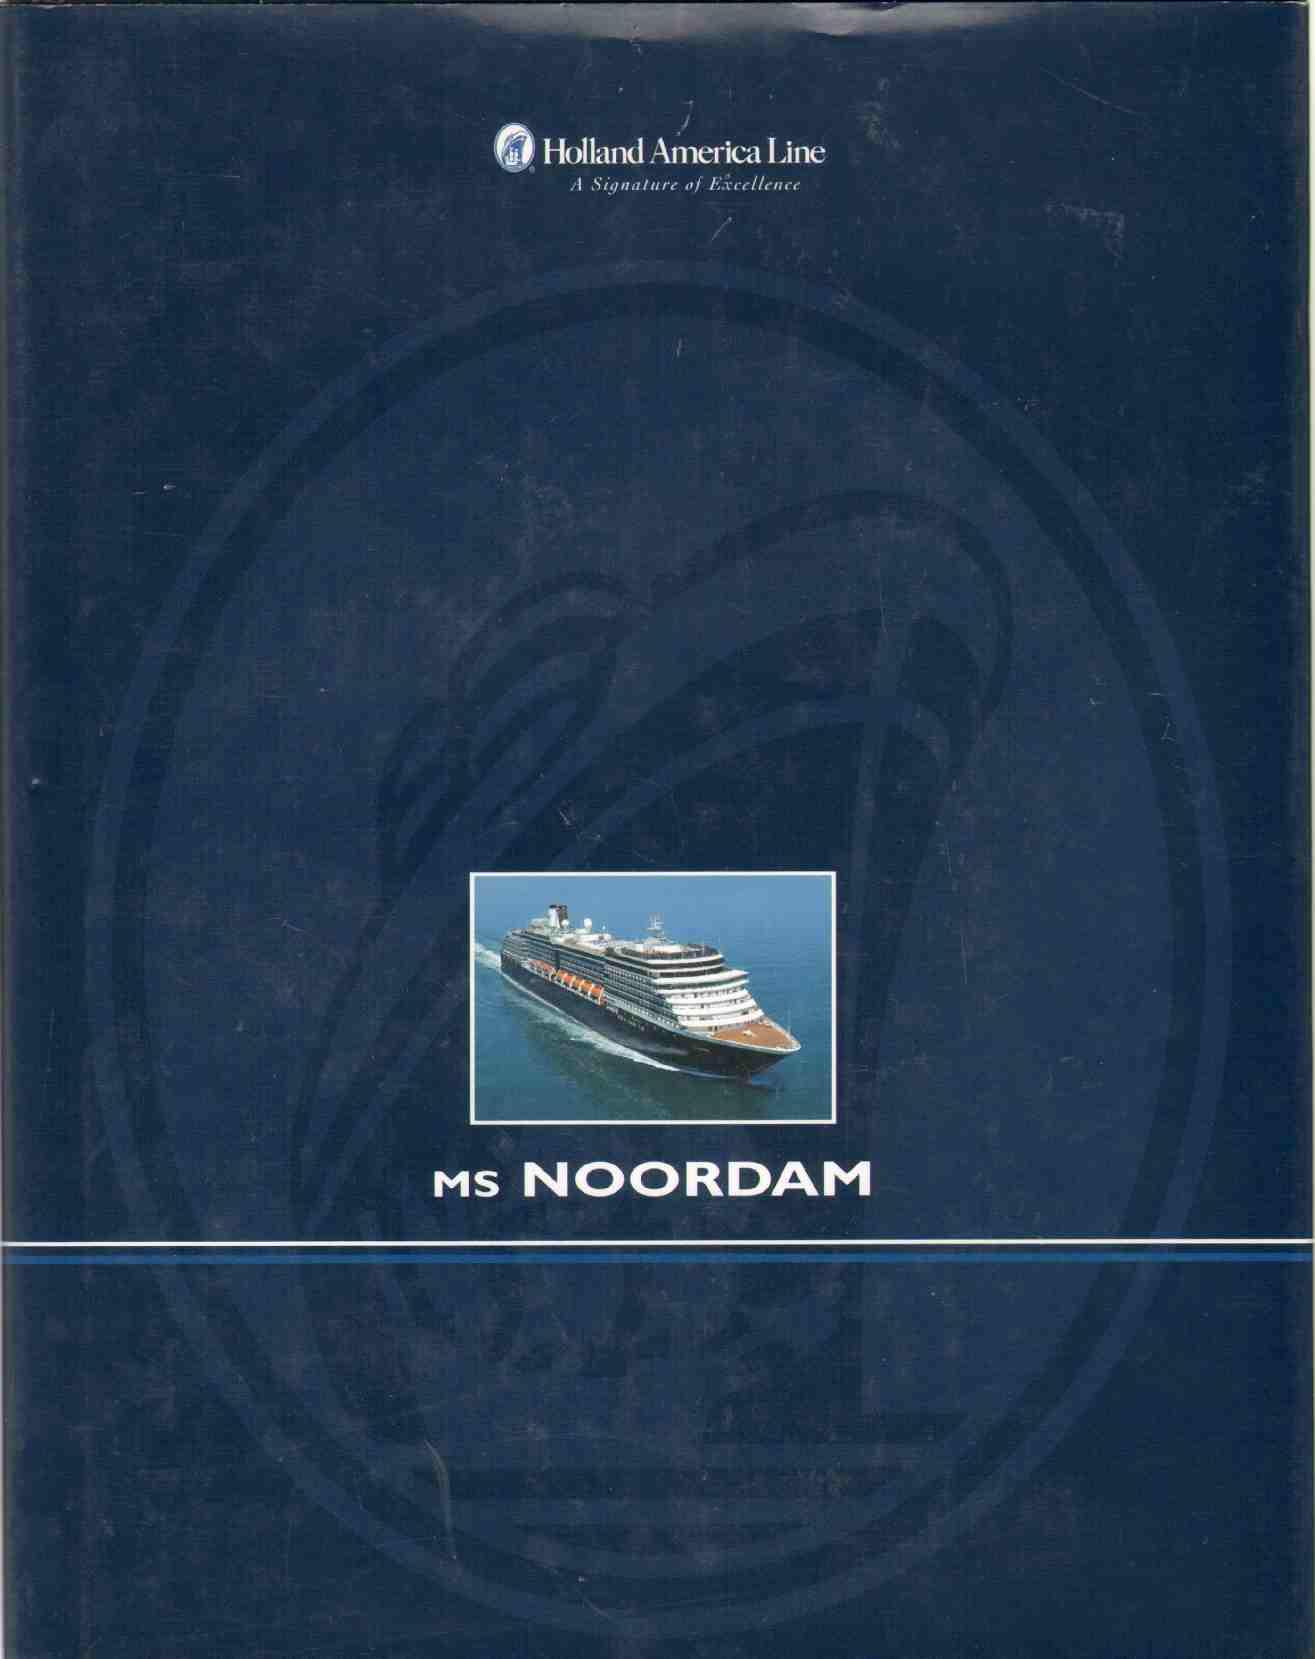 MS NOORDAM